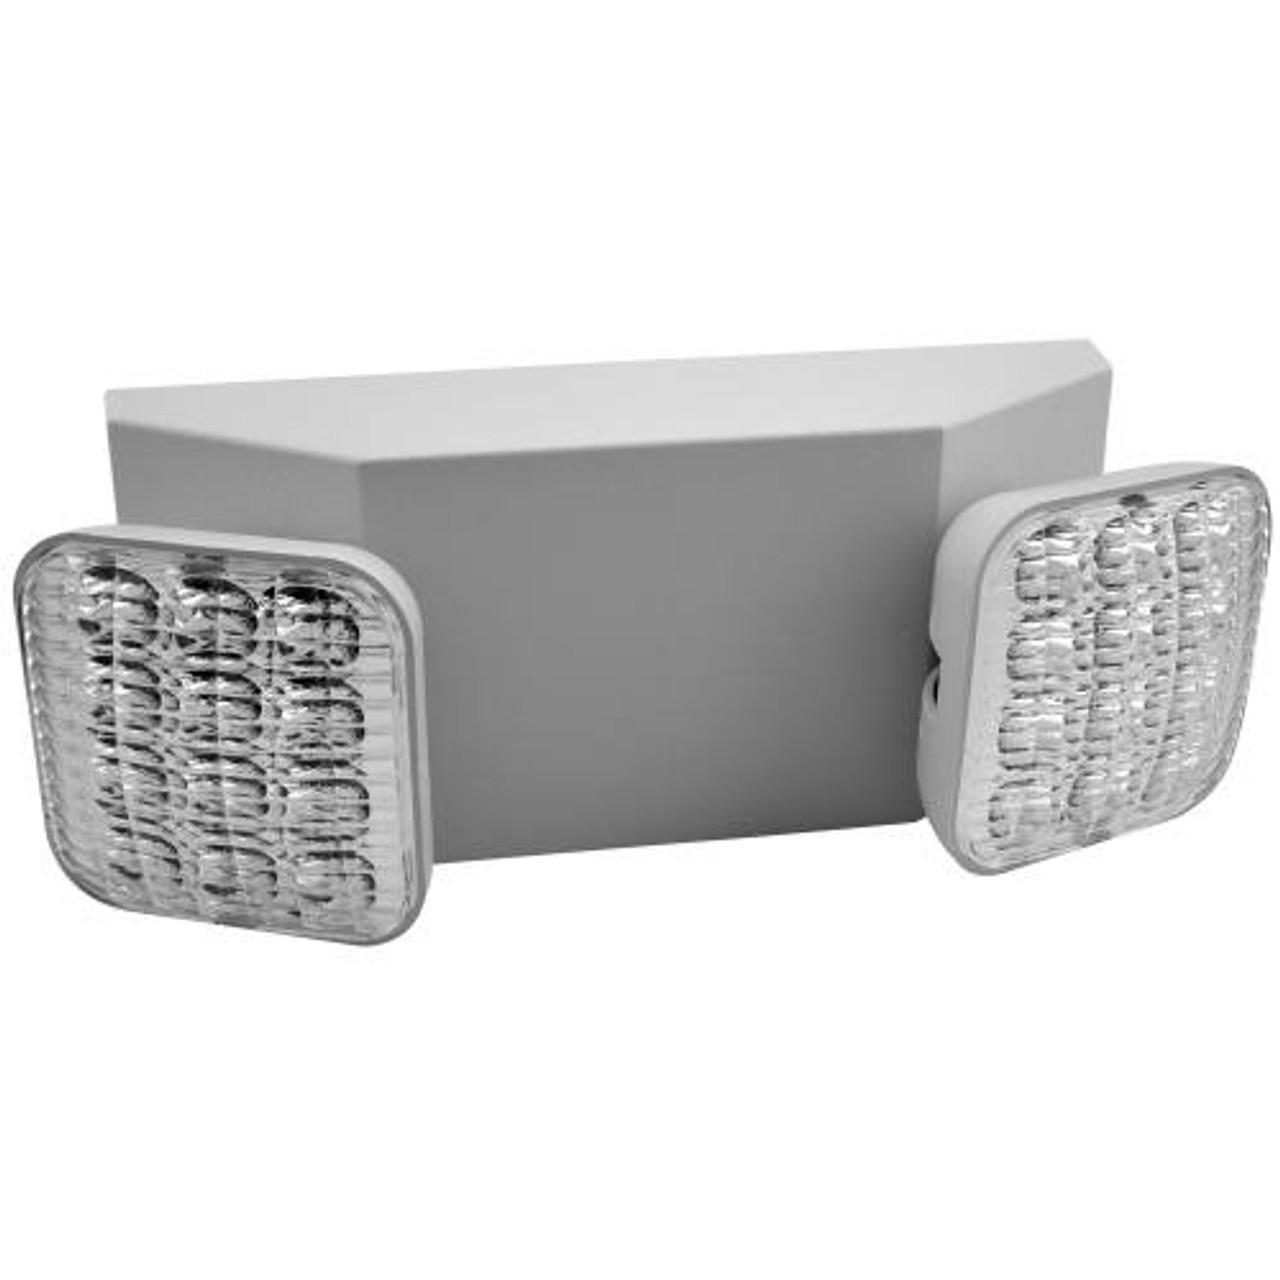 2-HEAD 2 WATT LED EMERGENCY UNIT (AL-EMSLED)White